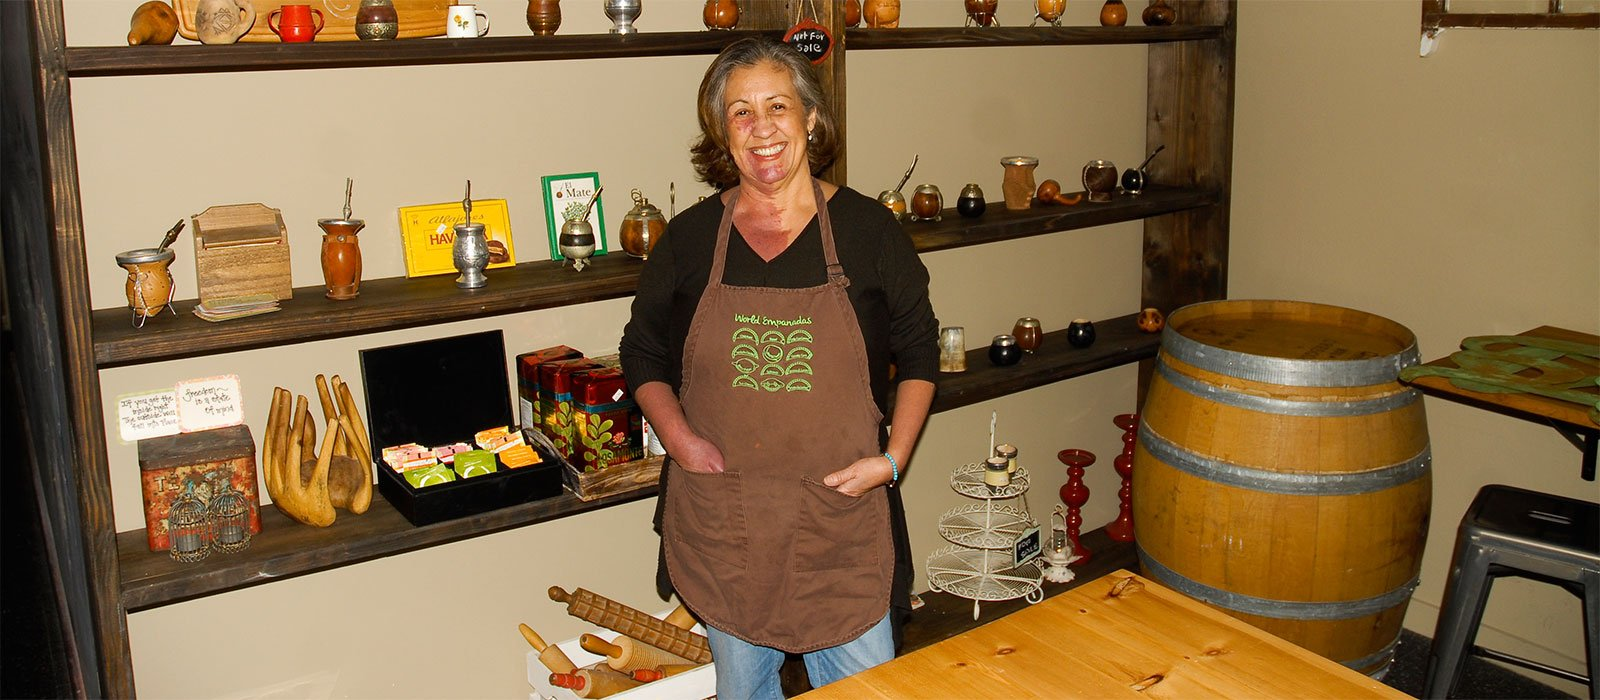 Lia Hirtz, Propietaria de World Empanadas